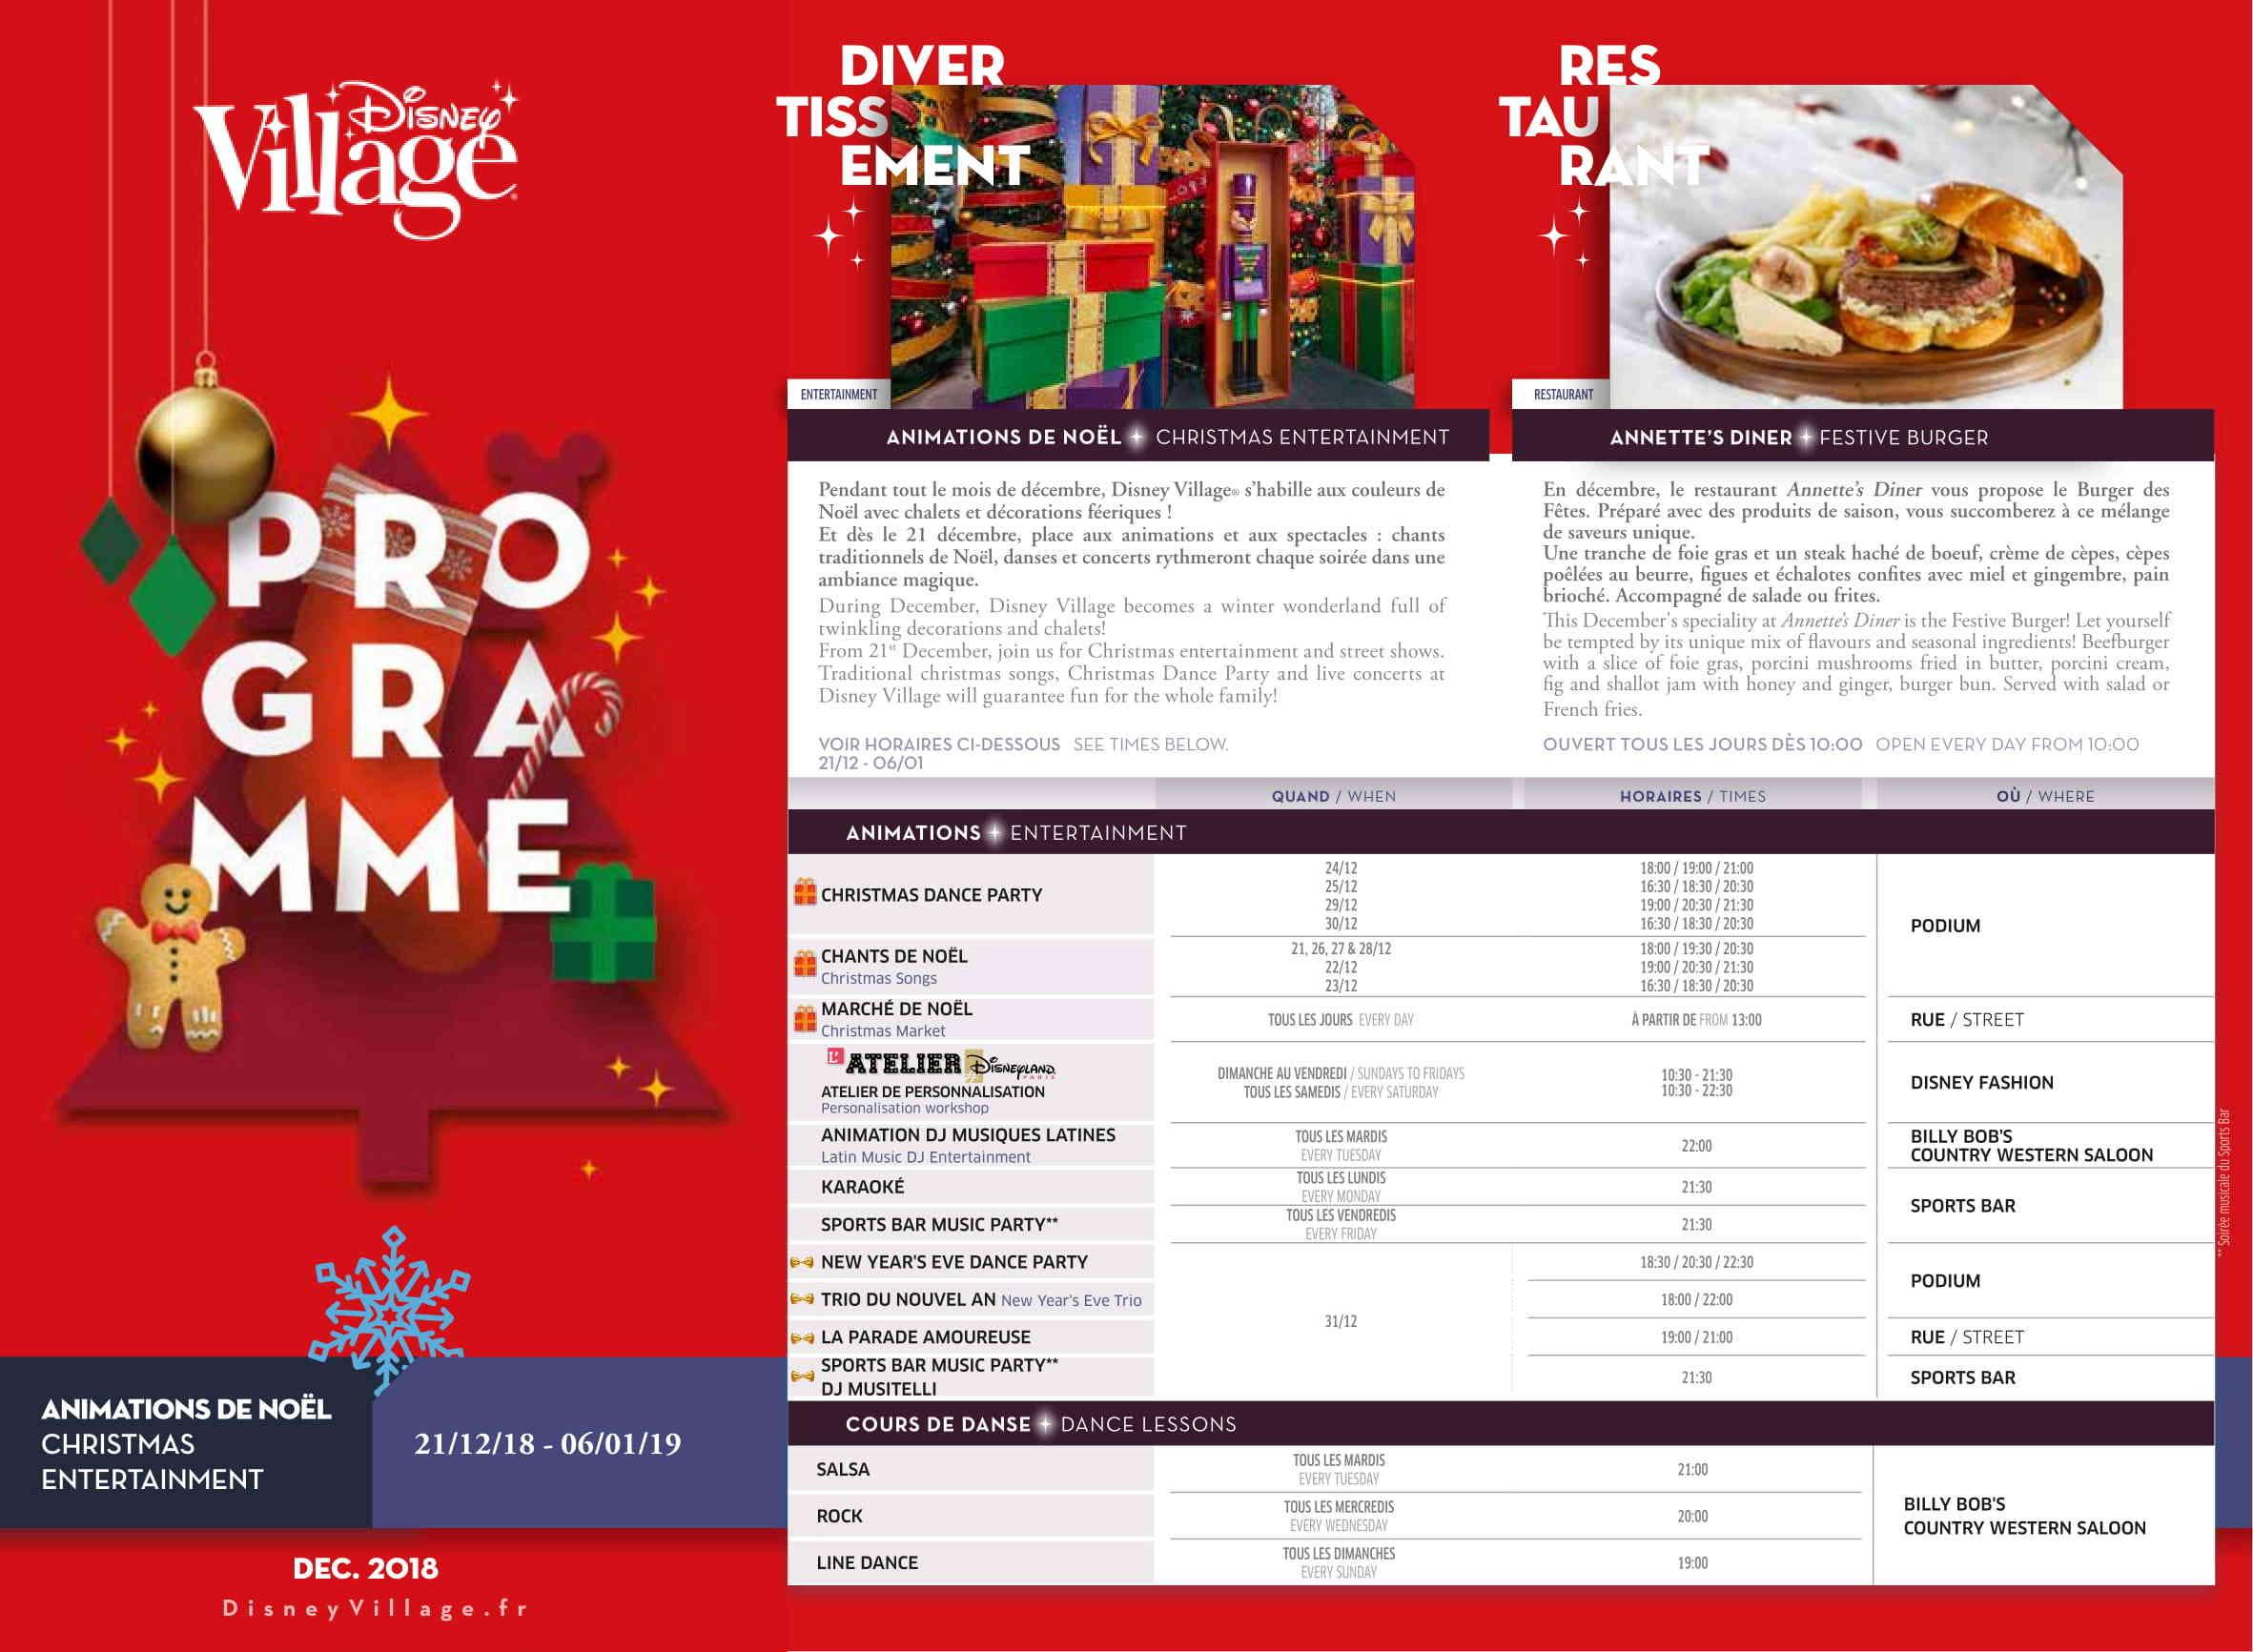 Novità dal Disney Village - Pagina 2 Dlp-pr10